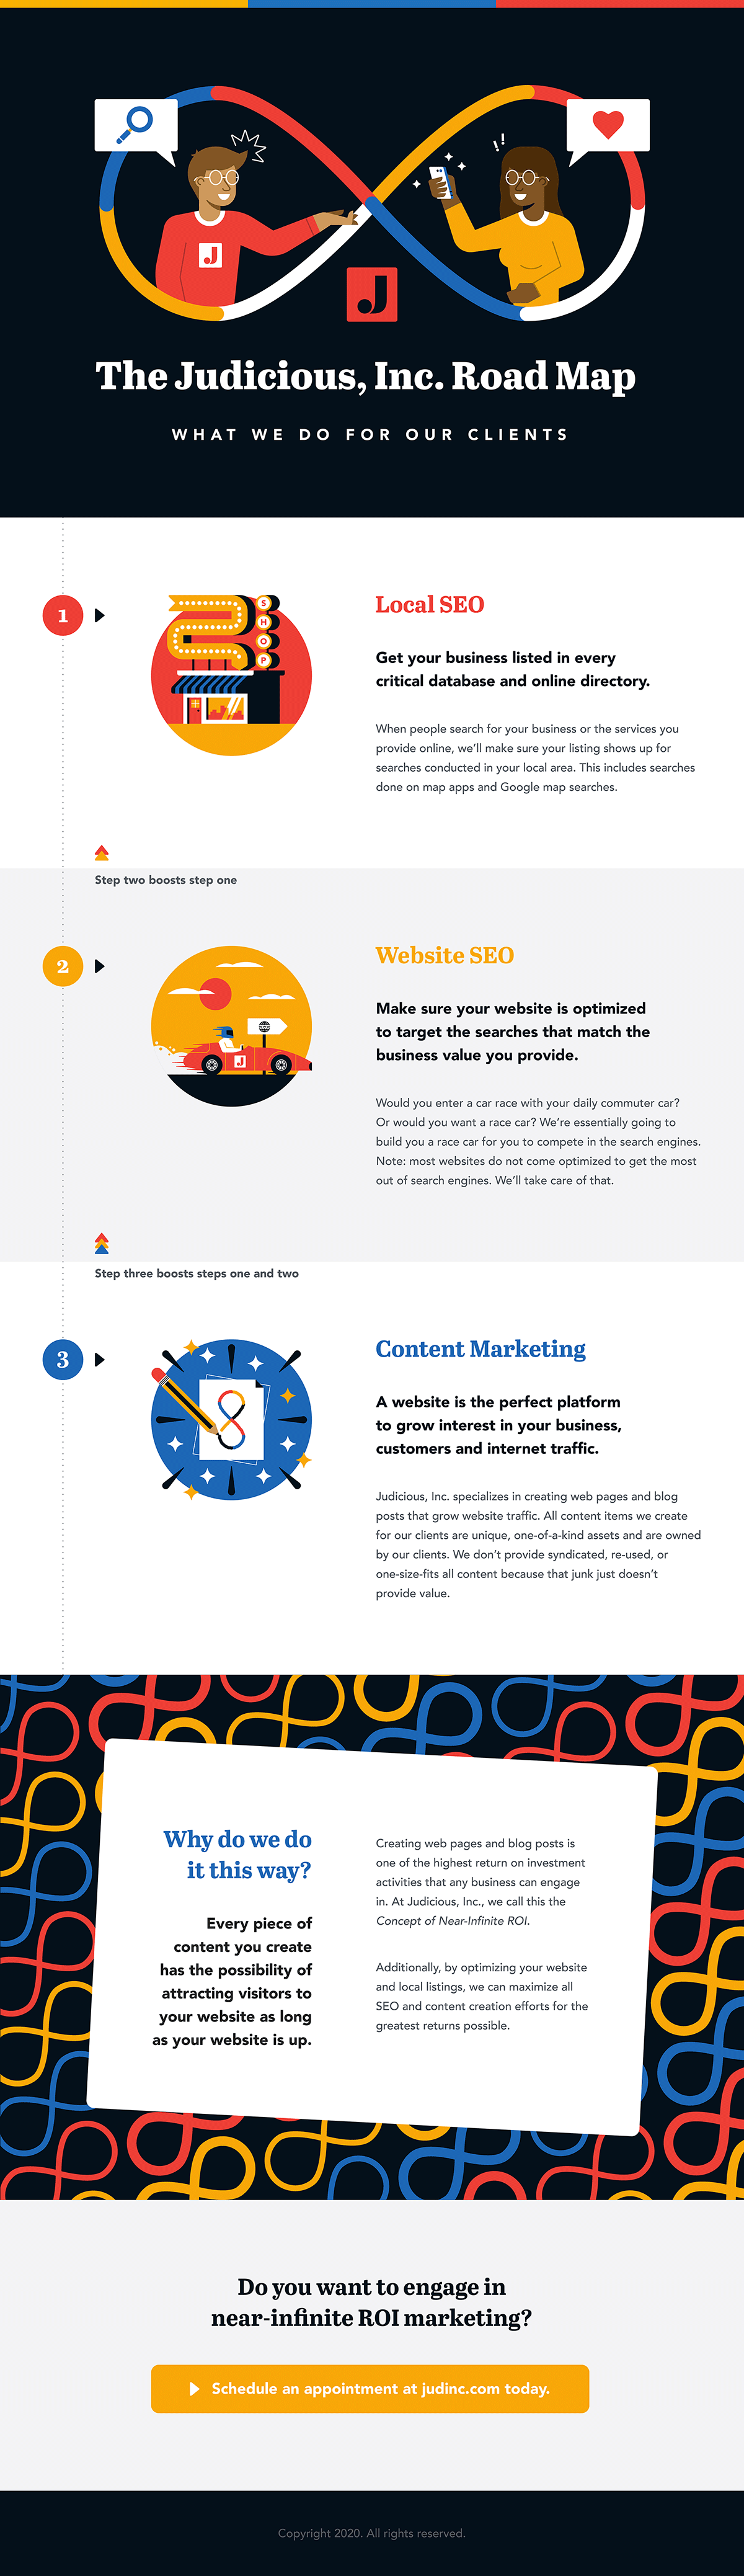 the search engine optimization SEO process